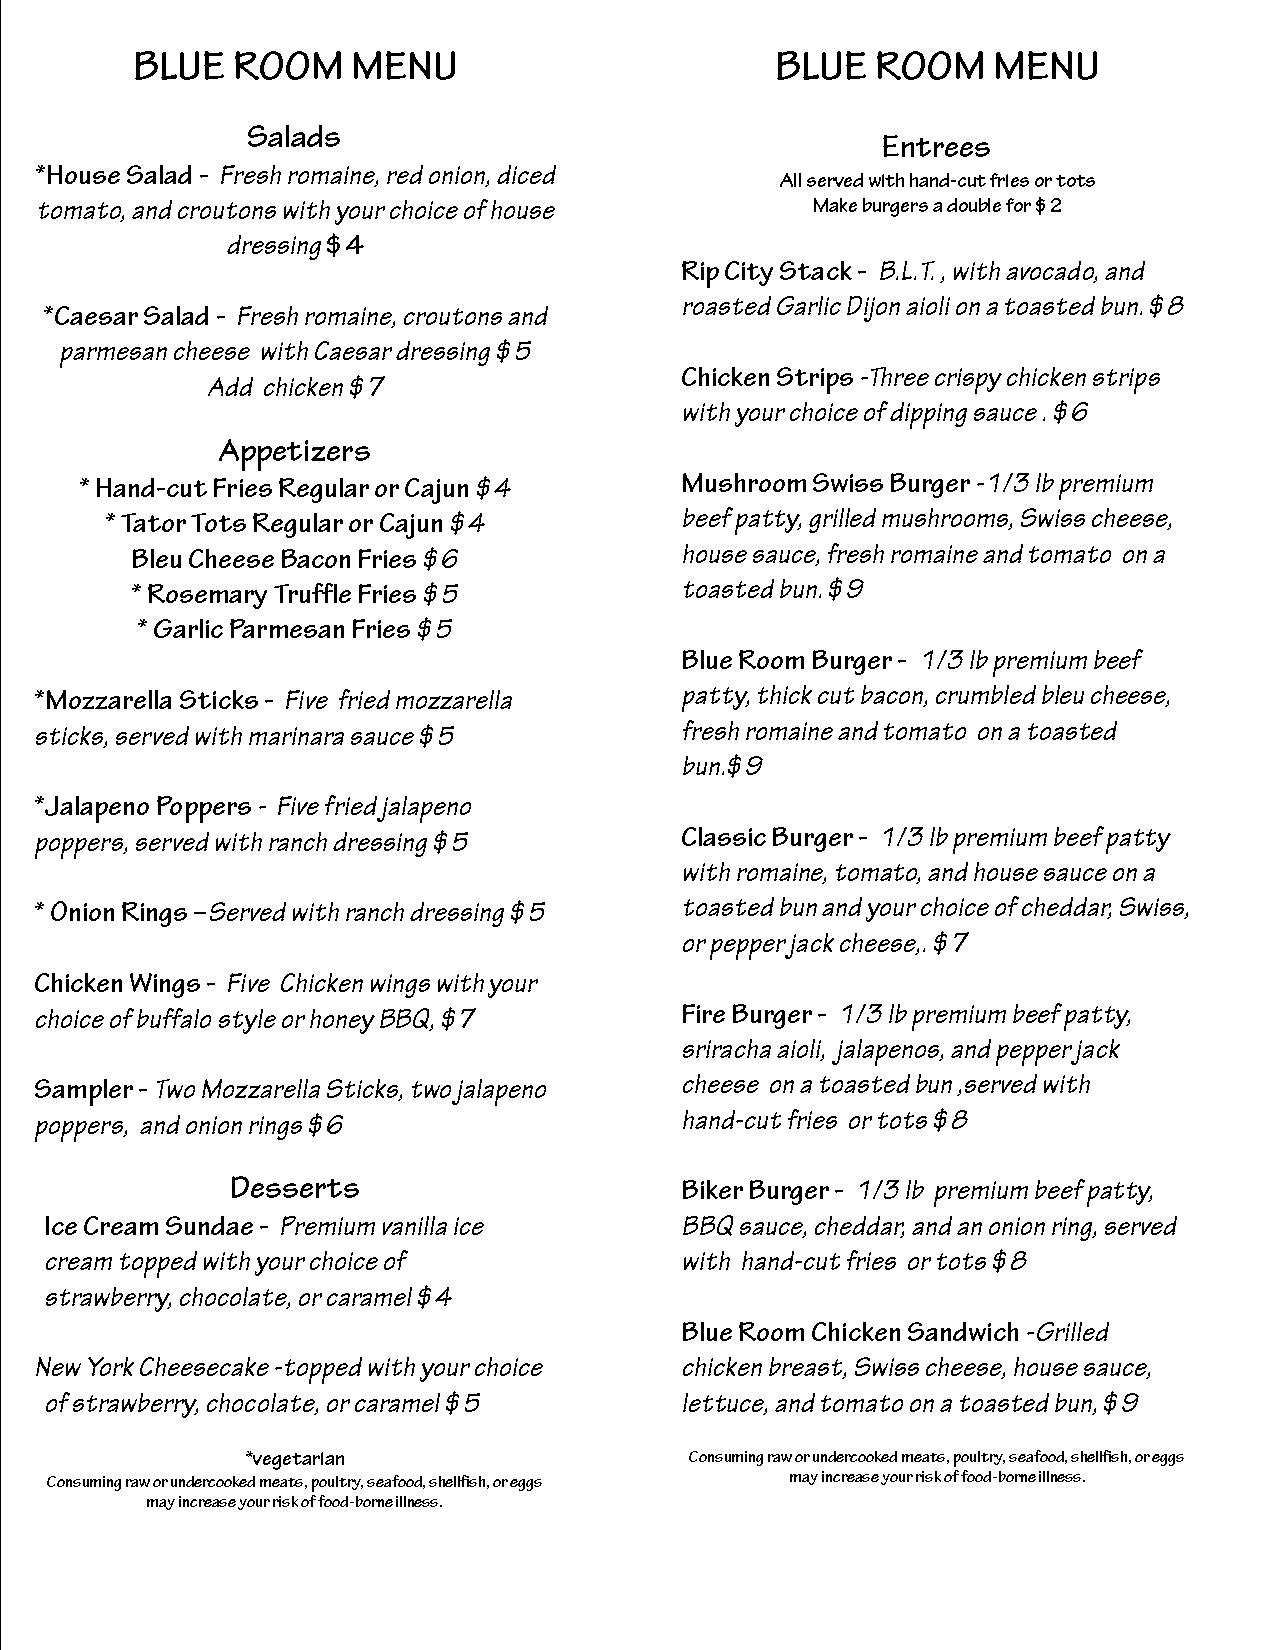 blue room menu (2) copy.jpg